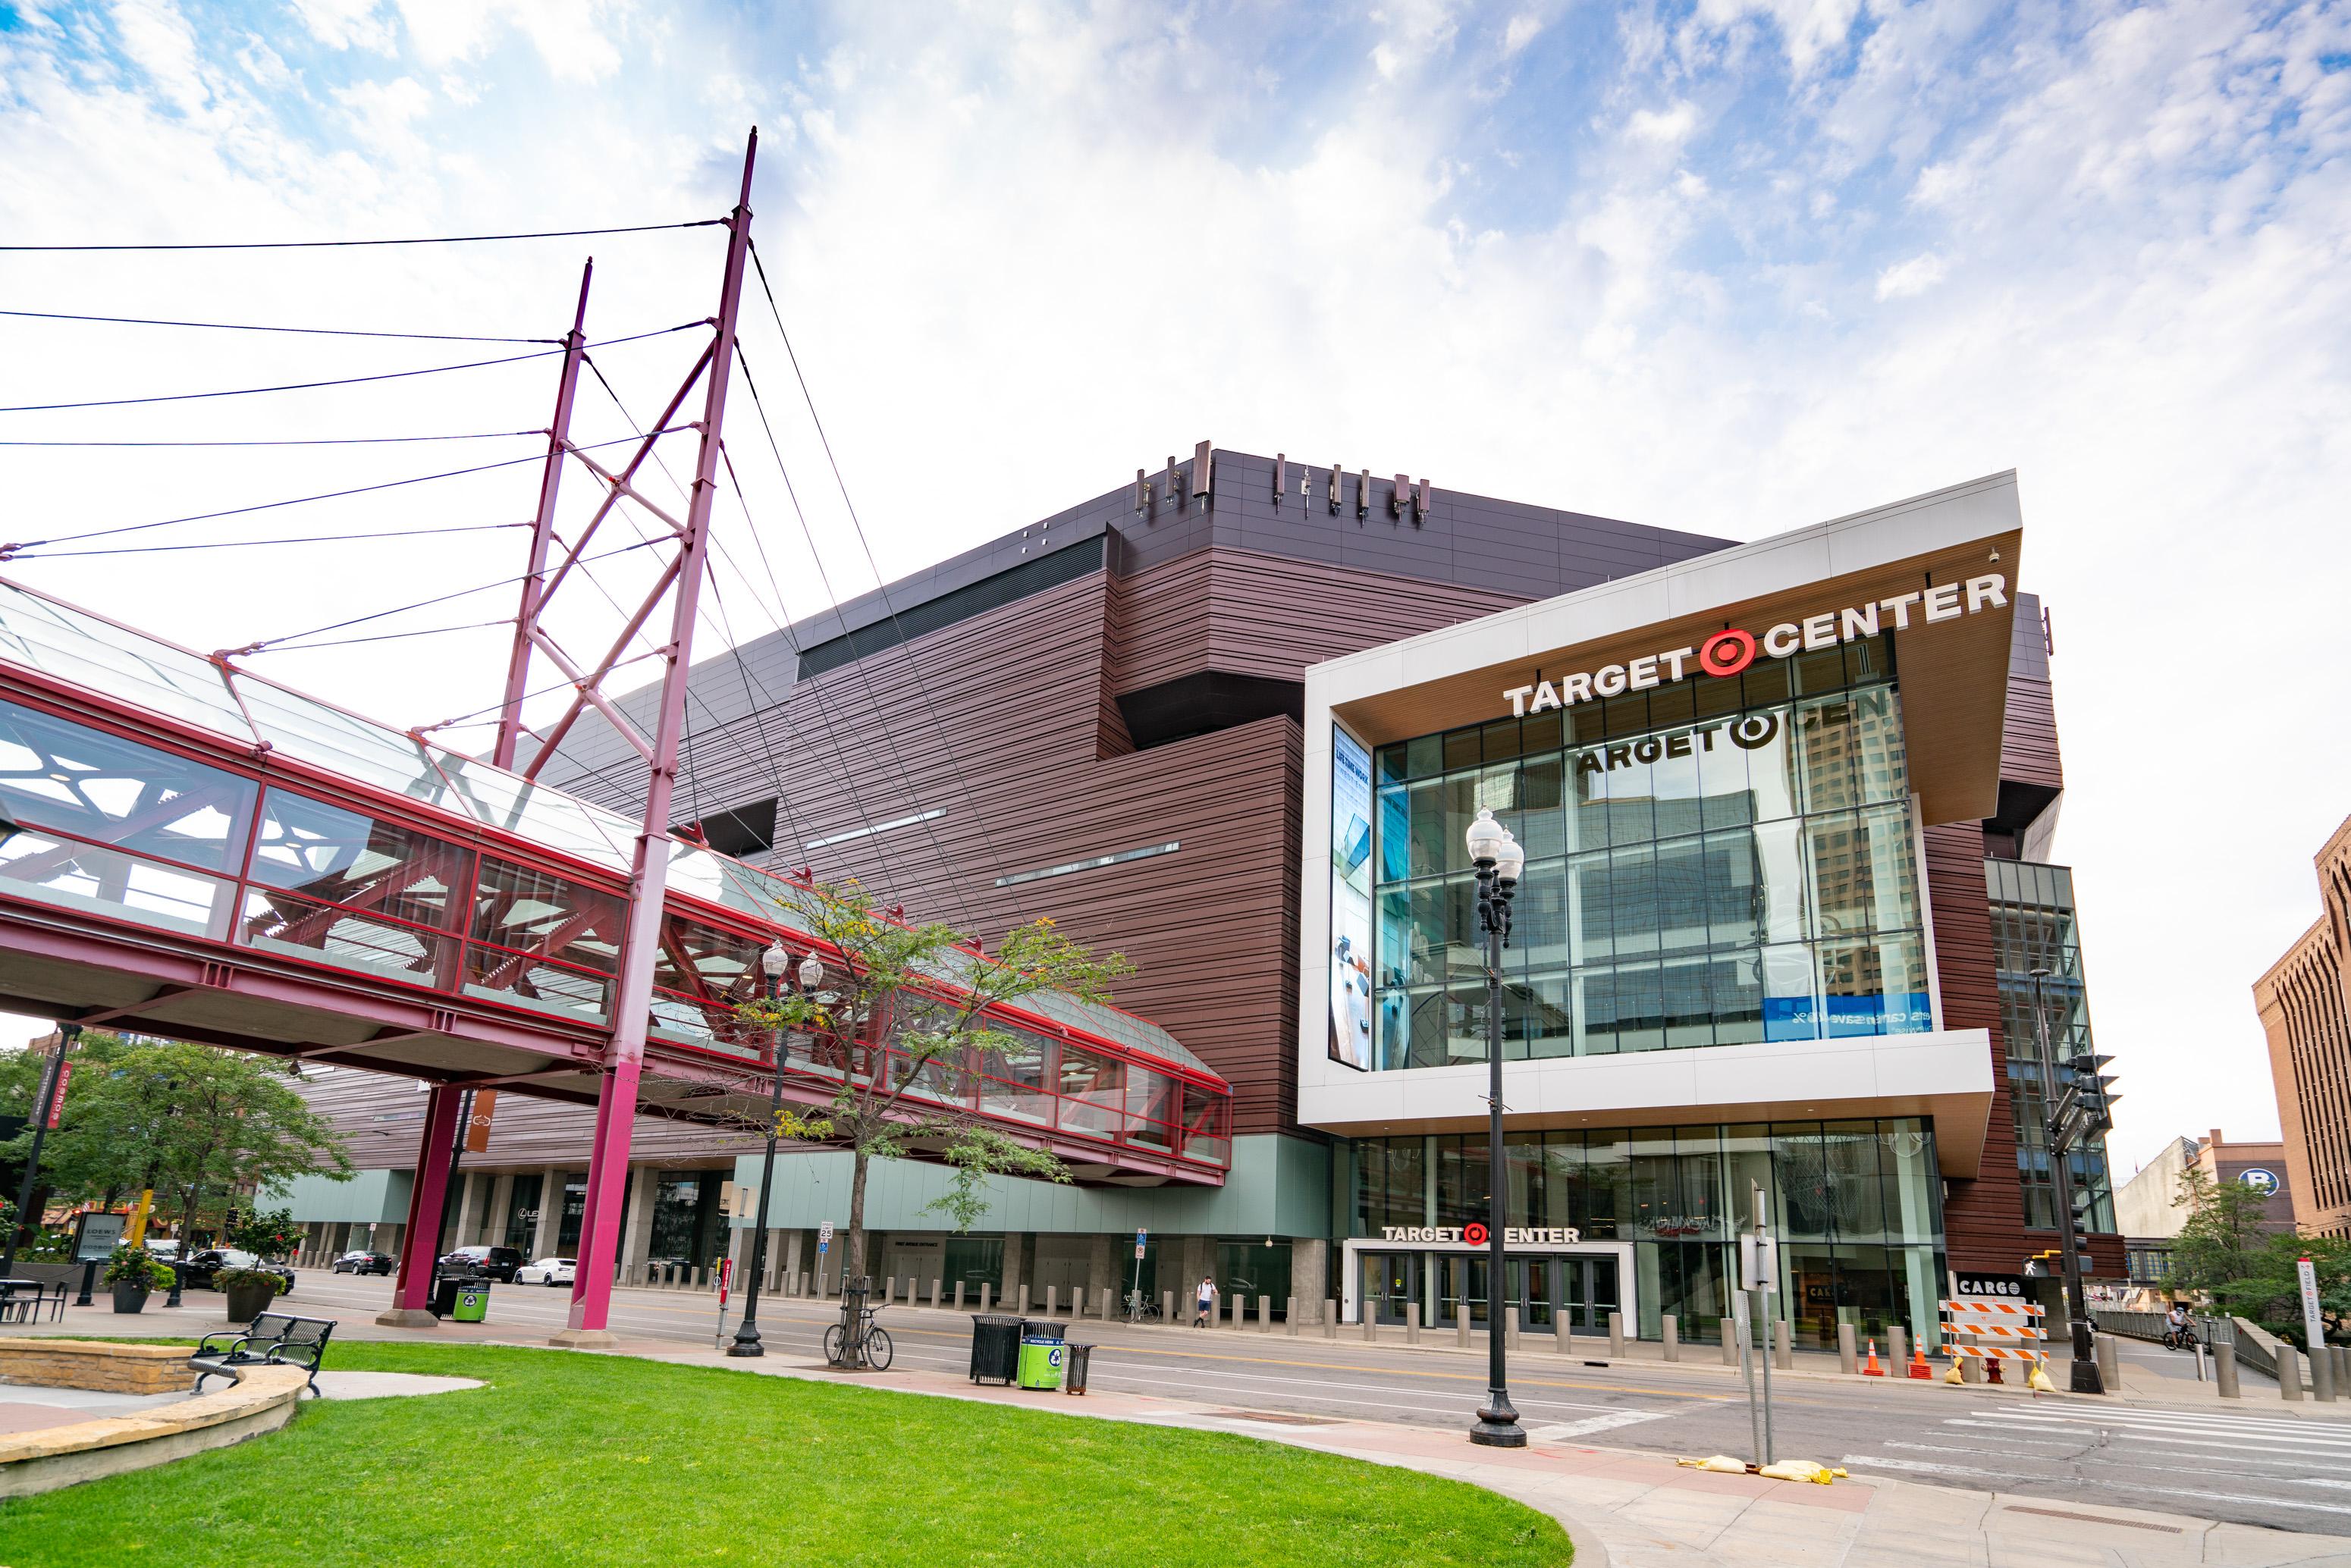 Minneapolis Exteriors And Landmarks - 2020